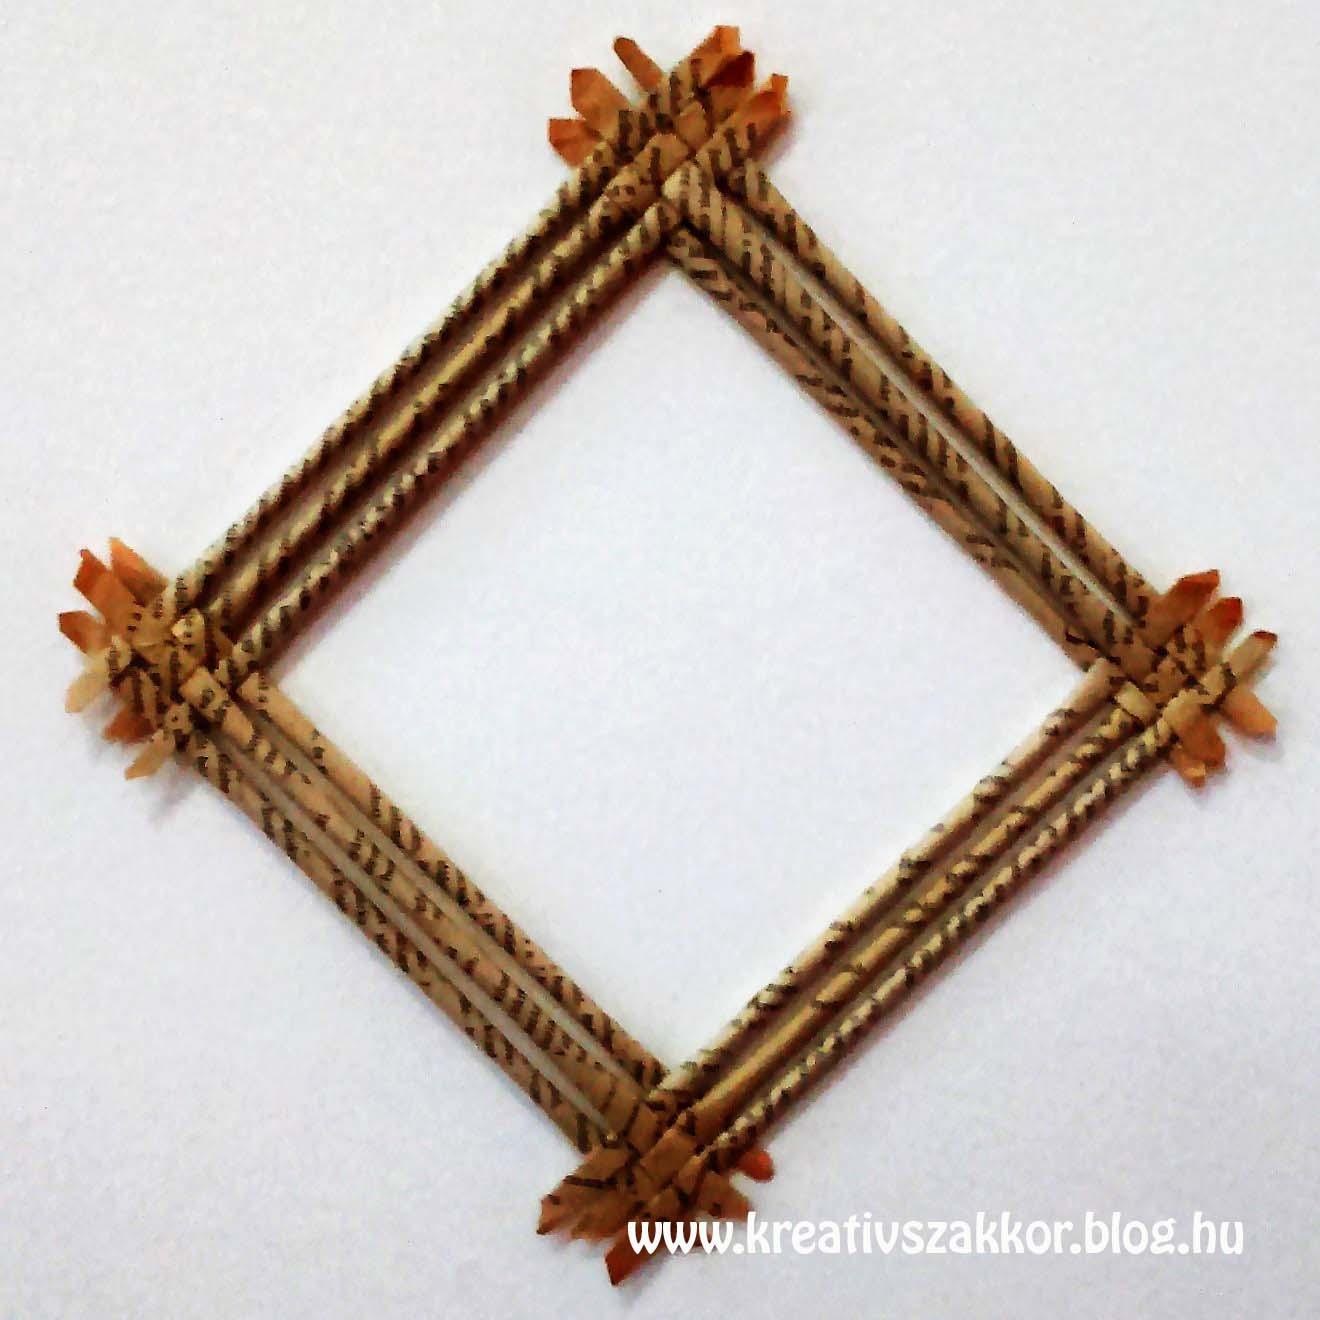 kepkeret_konyvlapokbol-3.jpg